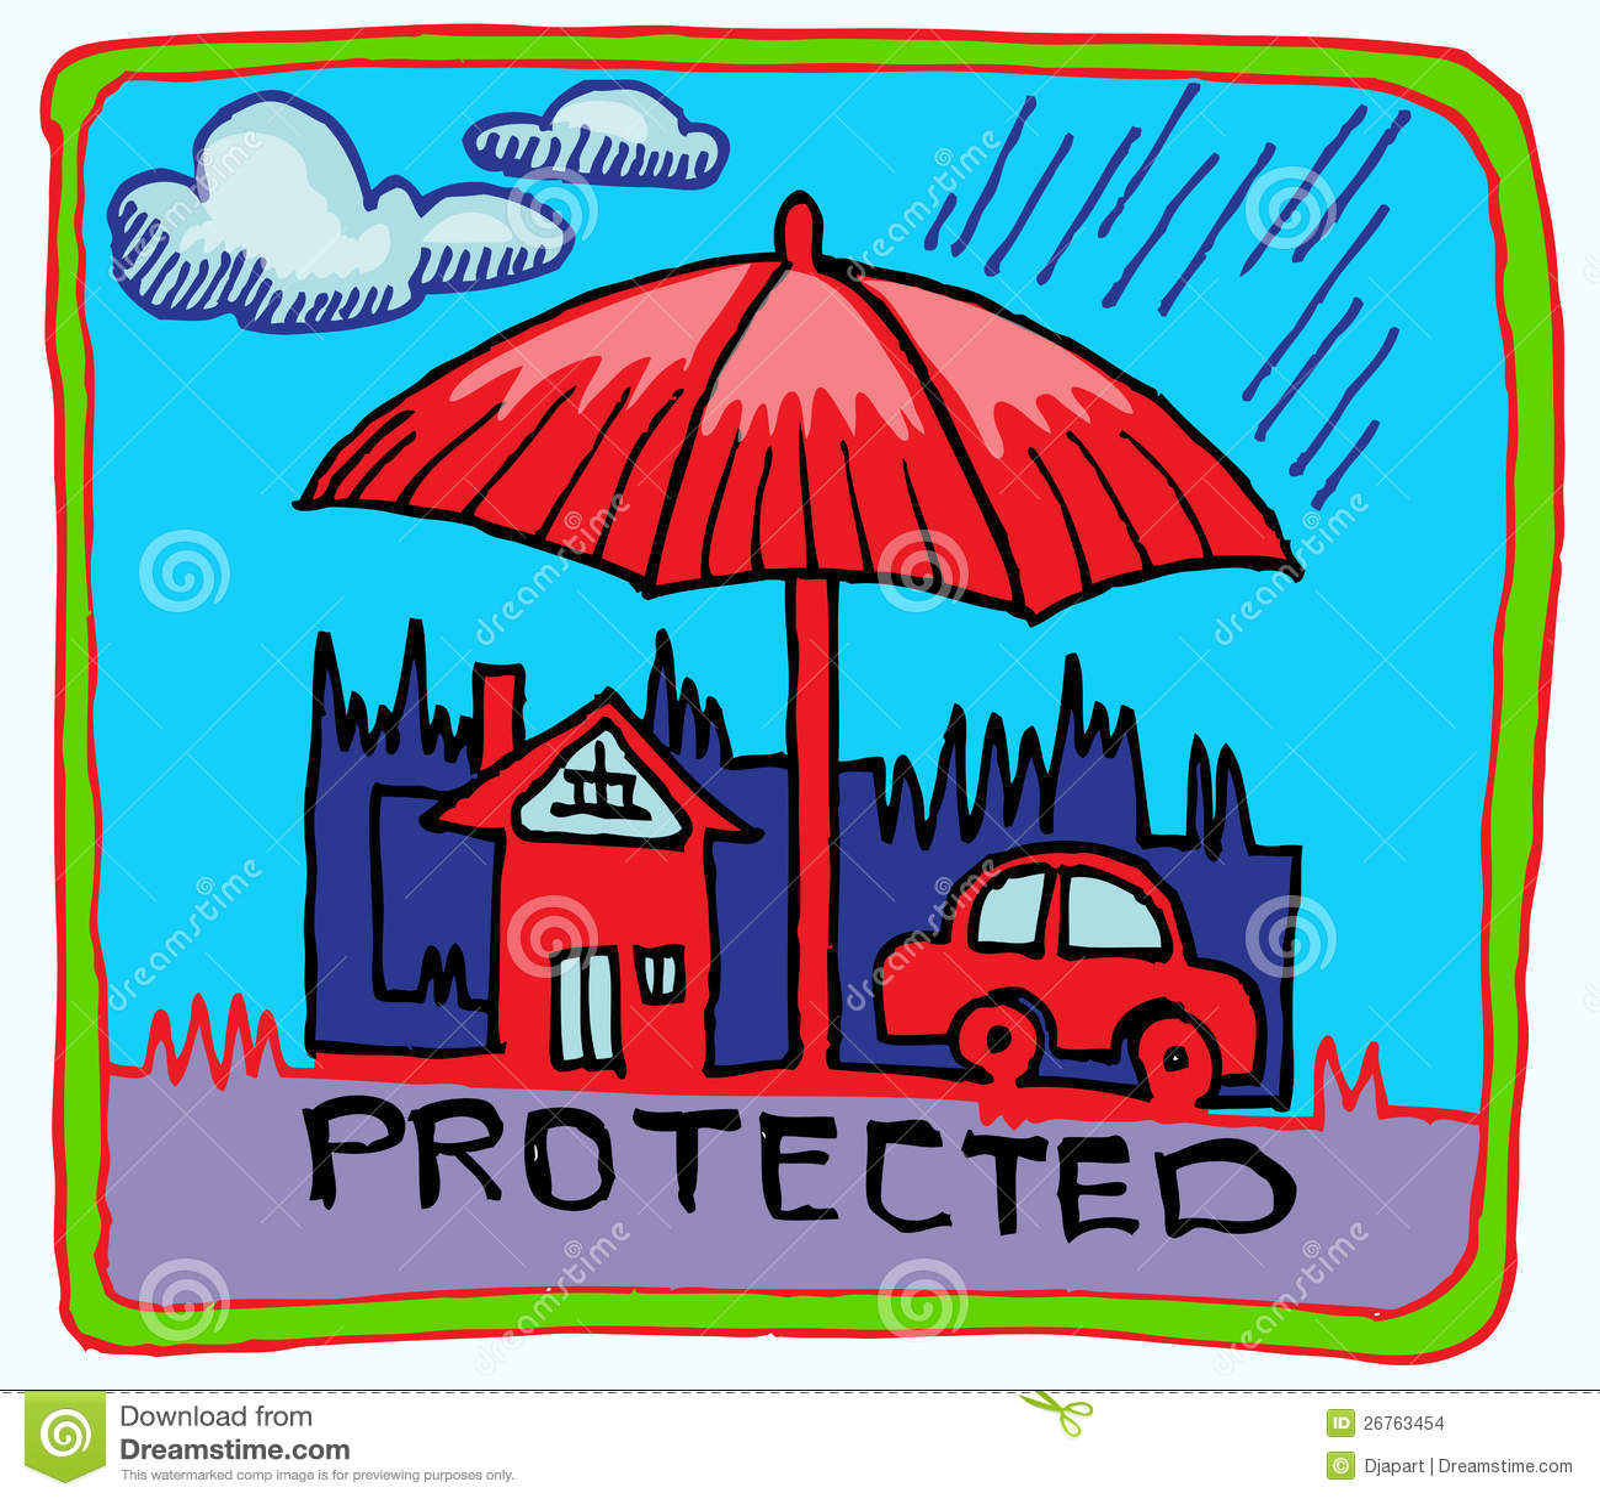 Commercial Auto Insurance Commercial Insurance Auto Symbols